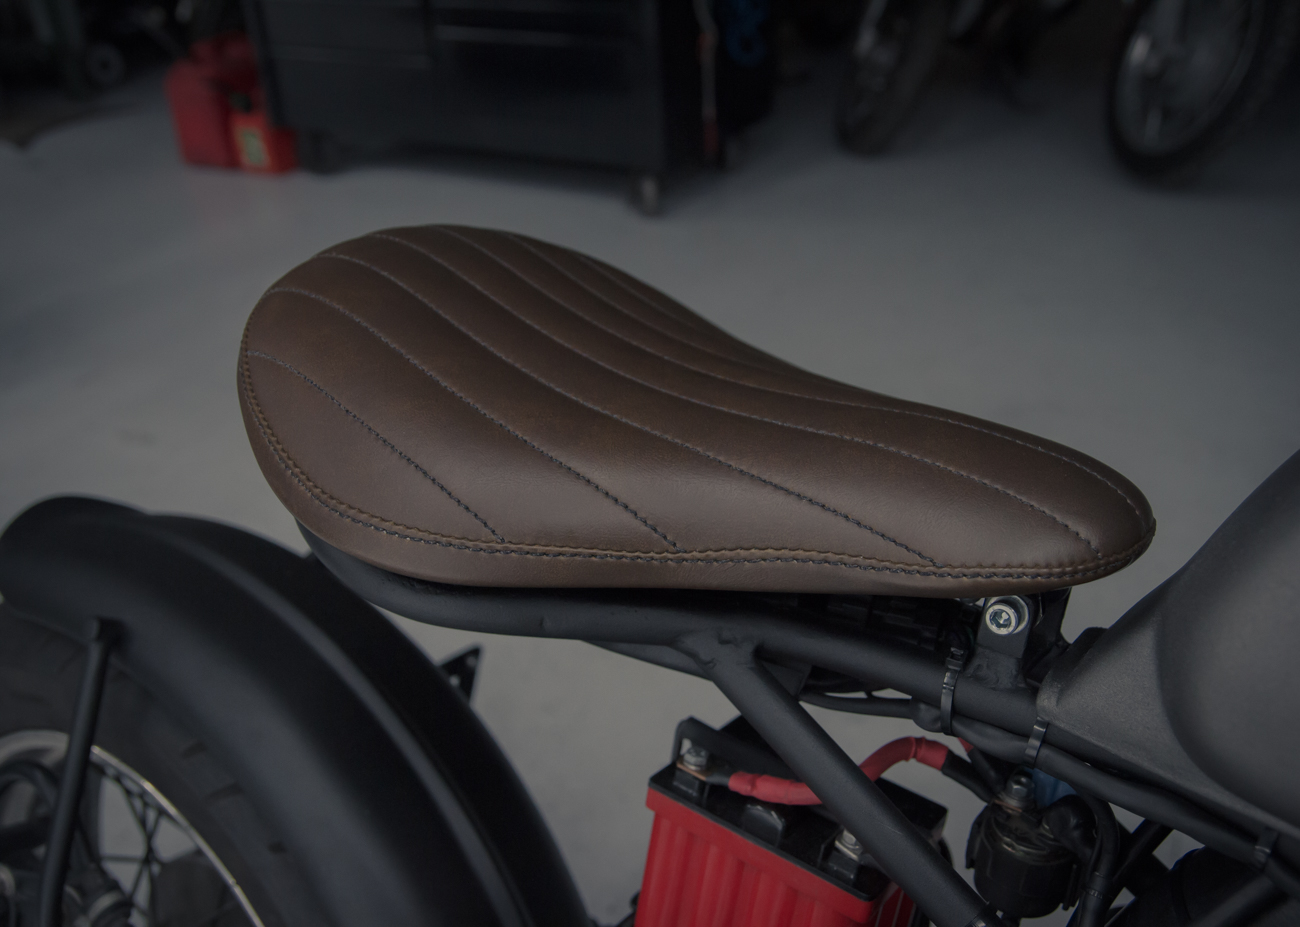 truimph custom seat rear fender atx moto-5.jpg